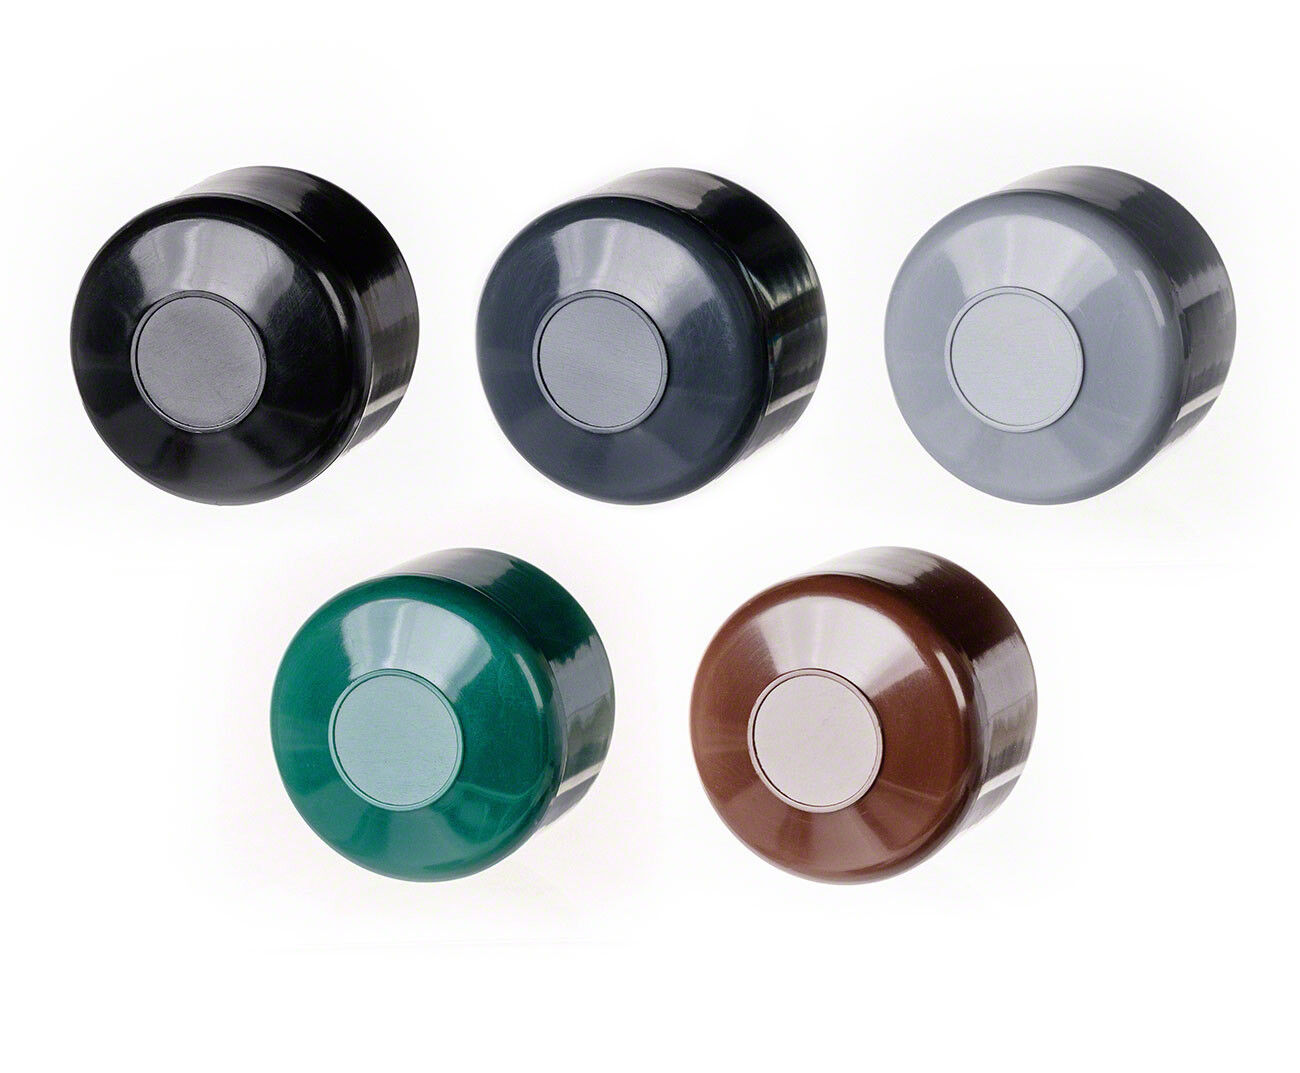 Zaunpfahlkappen 2/'/' 59,8 mm schwarz Rundstopfen Pfostenkappen Zaunkappen Pfosten